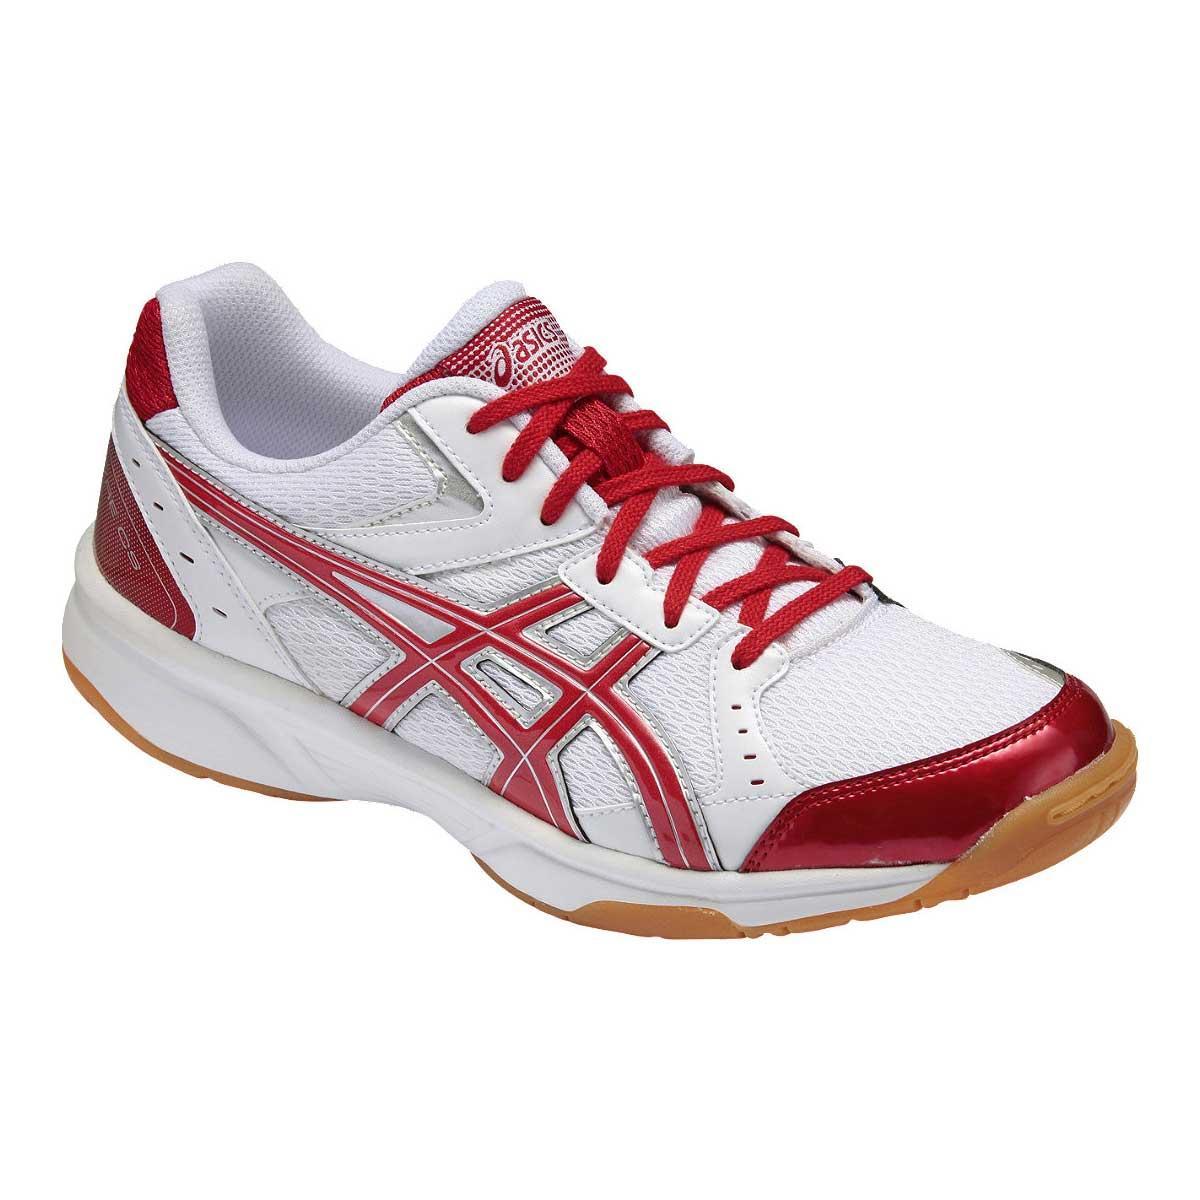 Asics Rivre CS Indoor Court Shoes (White/Red)